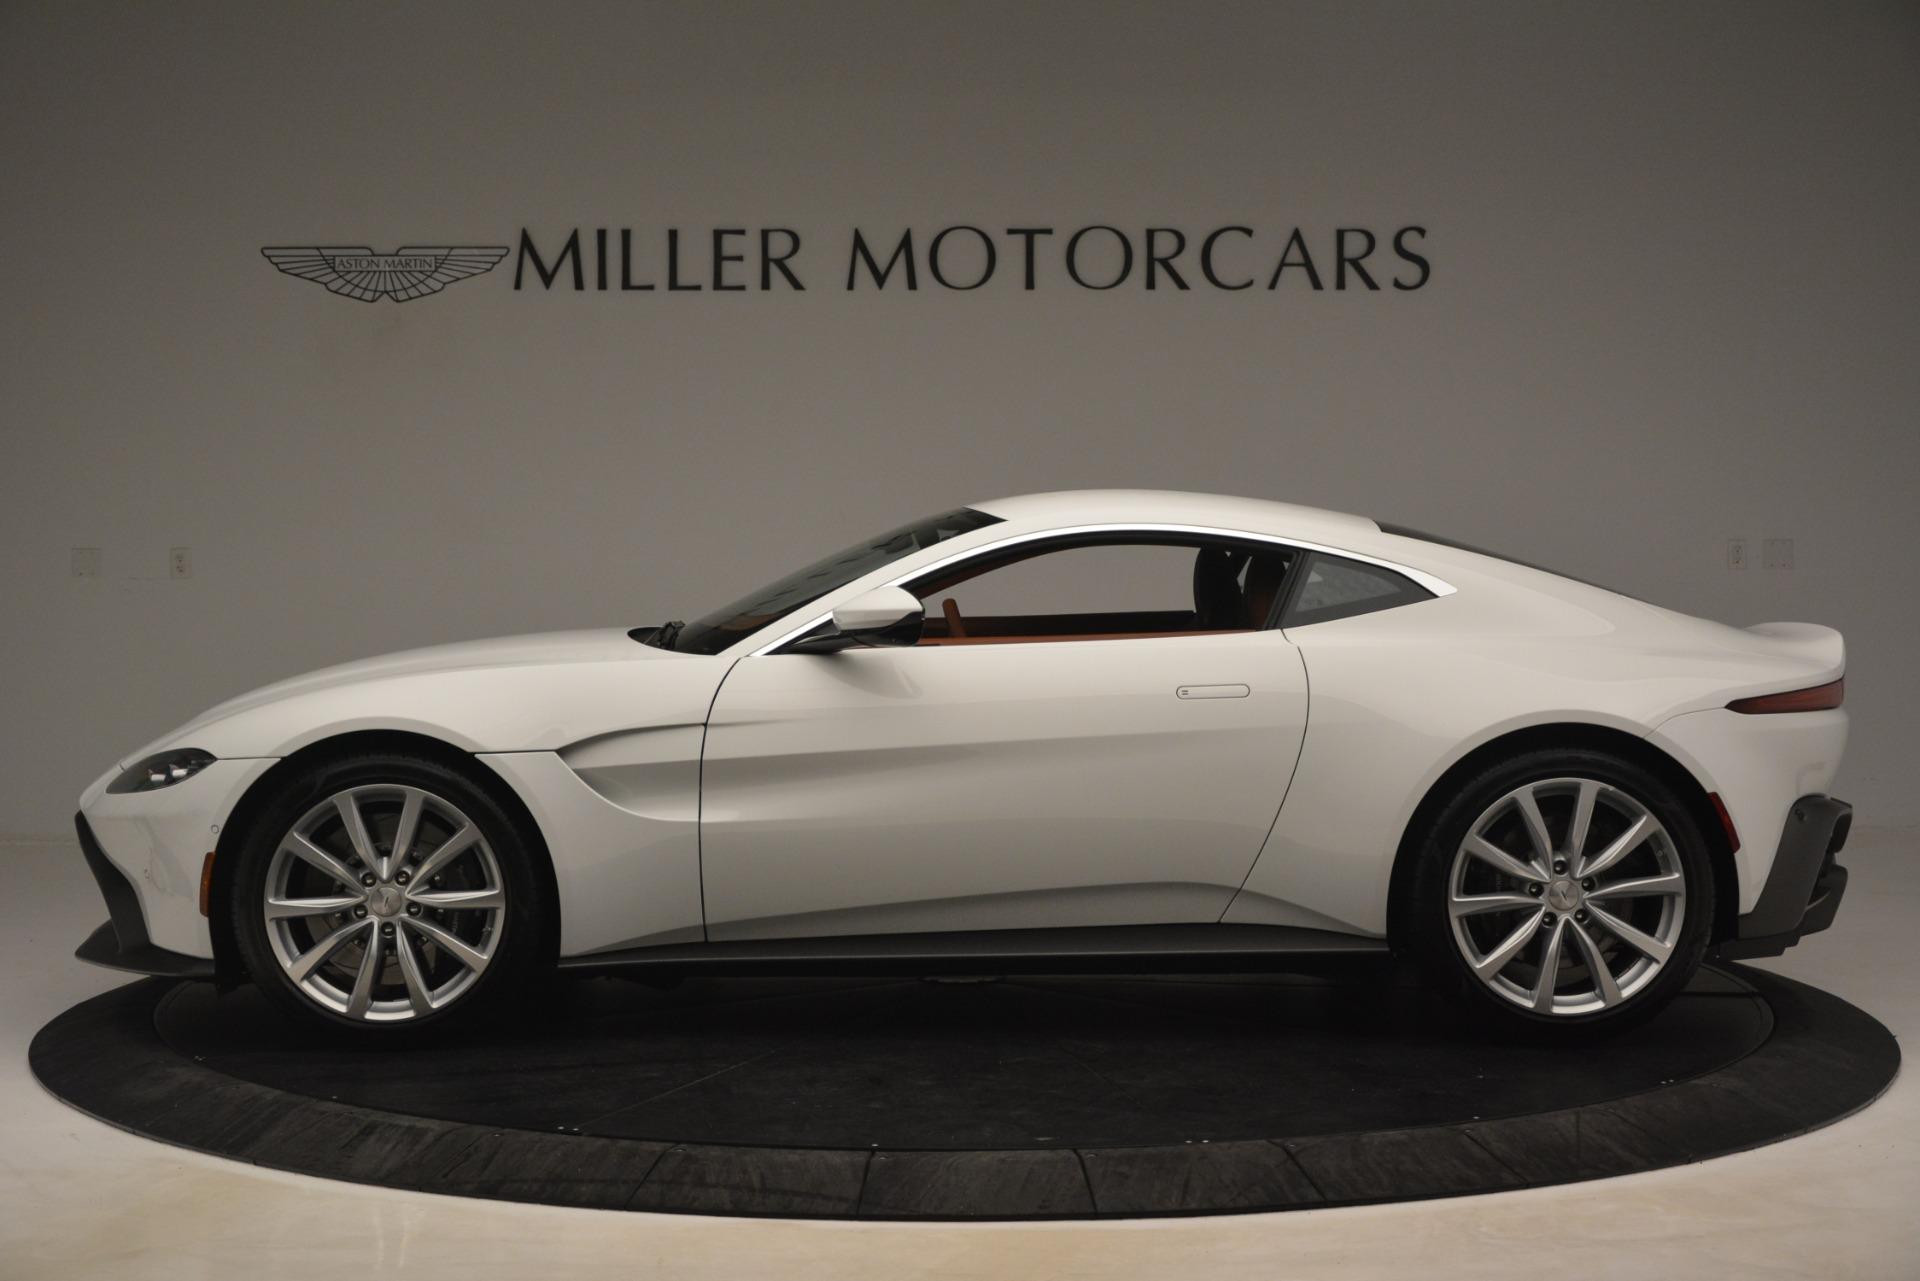 New 2019 Aston Martin Vantage Coupe For Sale In Greenwich, CT. Alfa Romeo of Greenwich, A1373 3227_p2